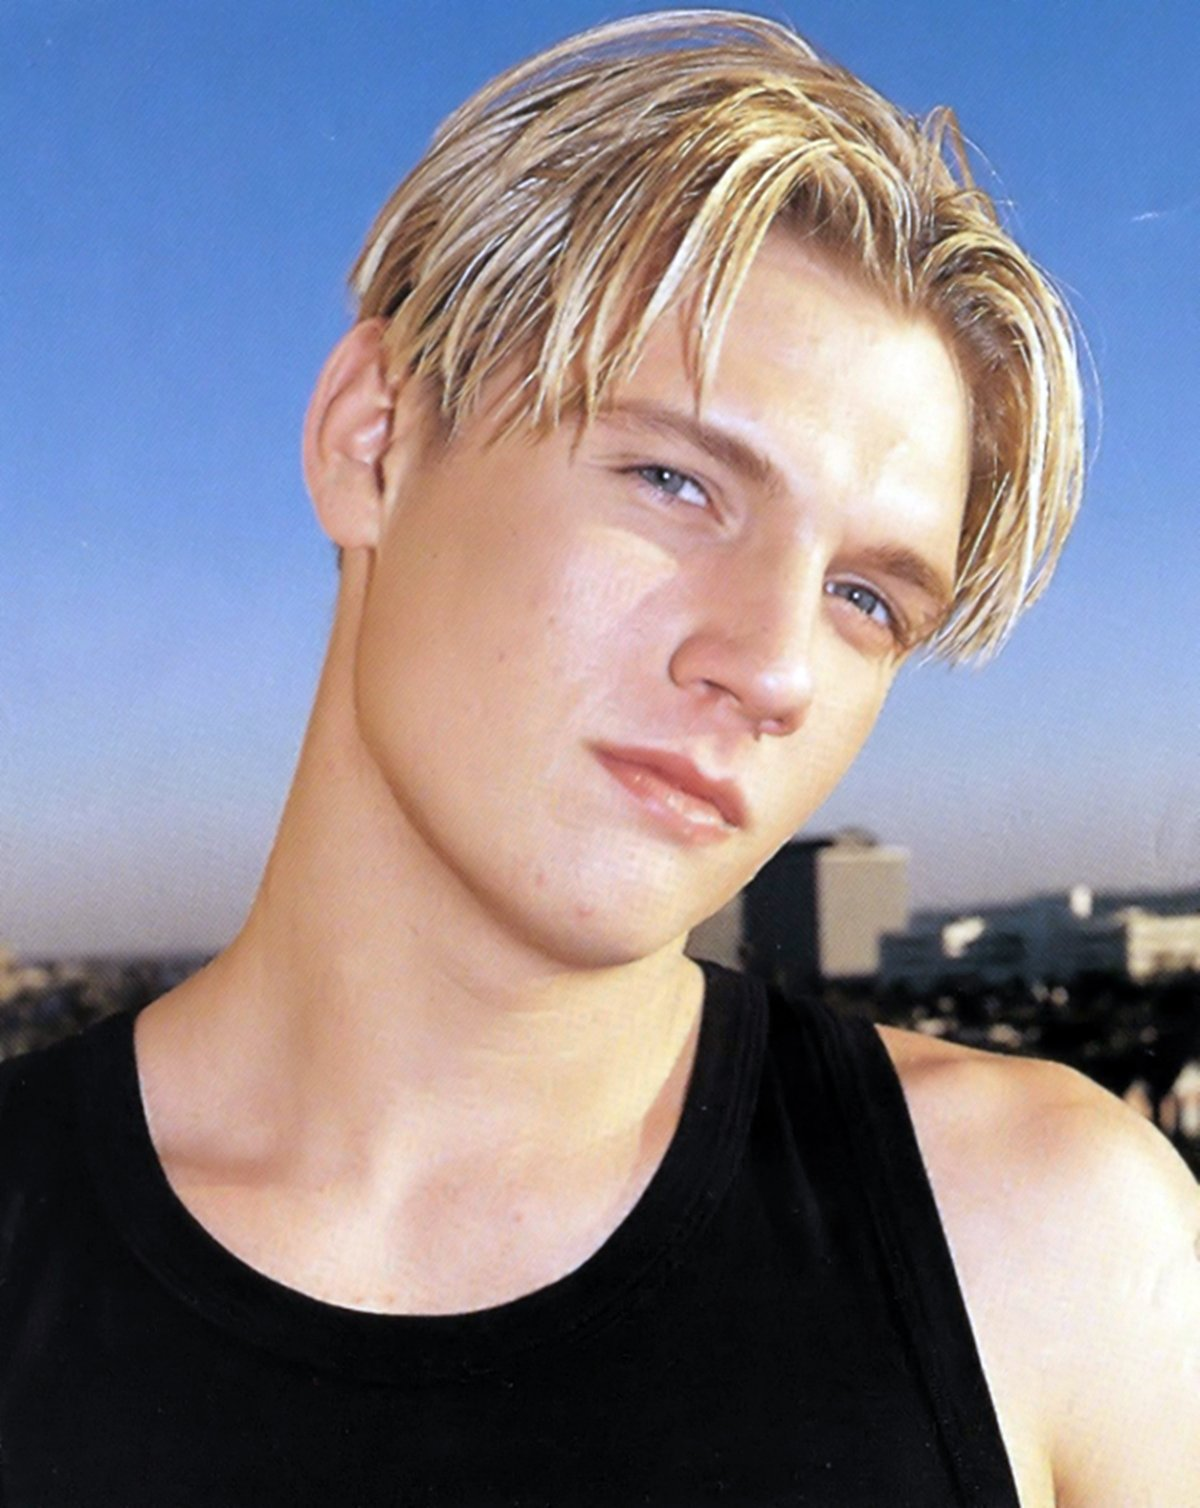 Nick Carter of the Backstreet Boys